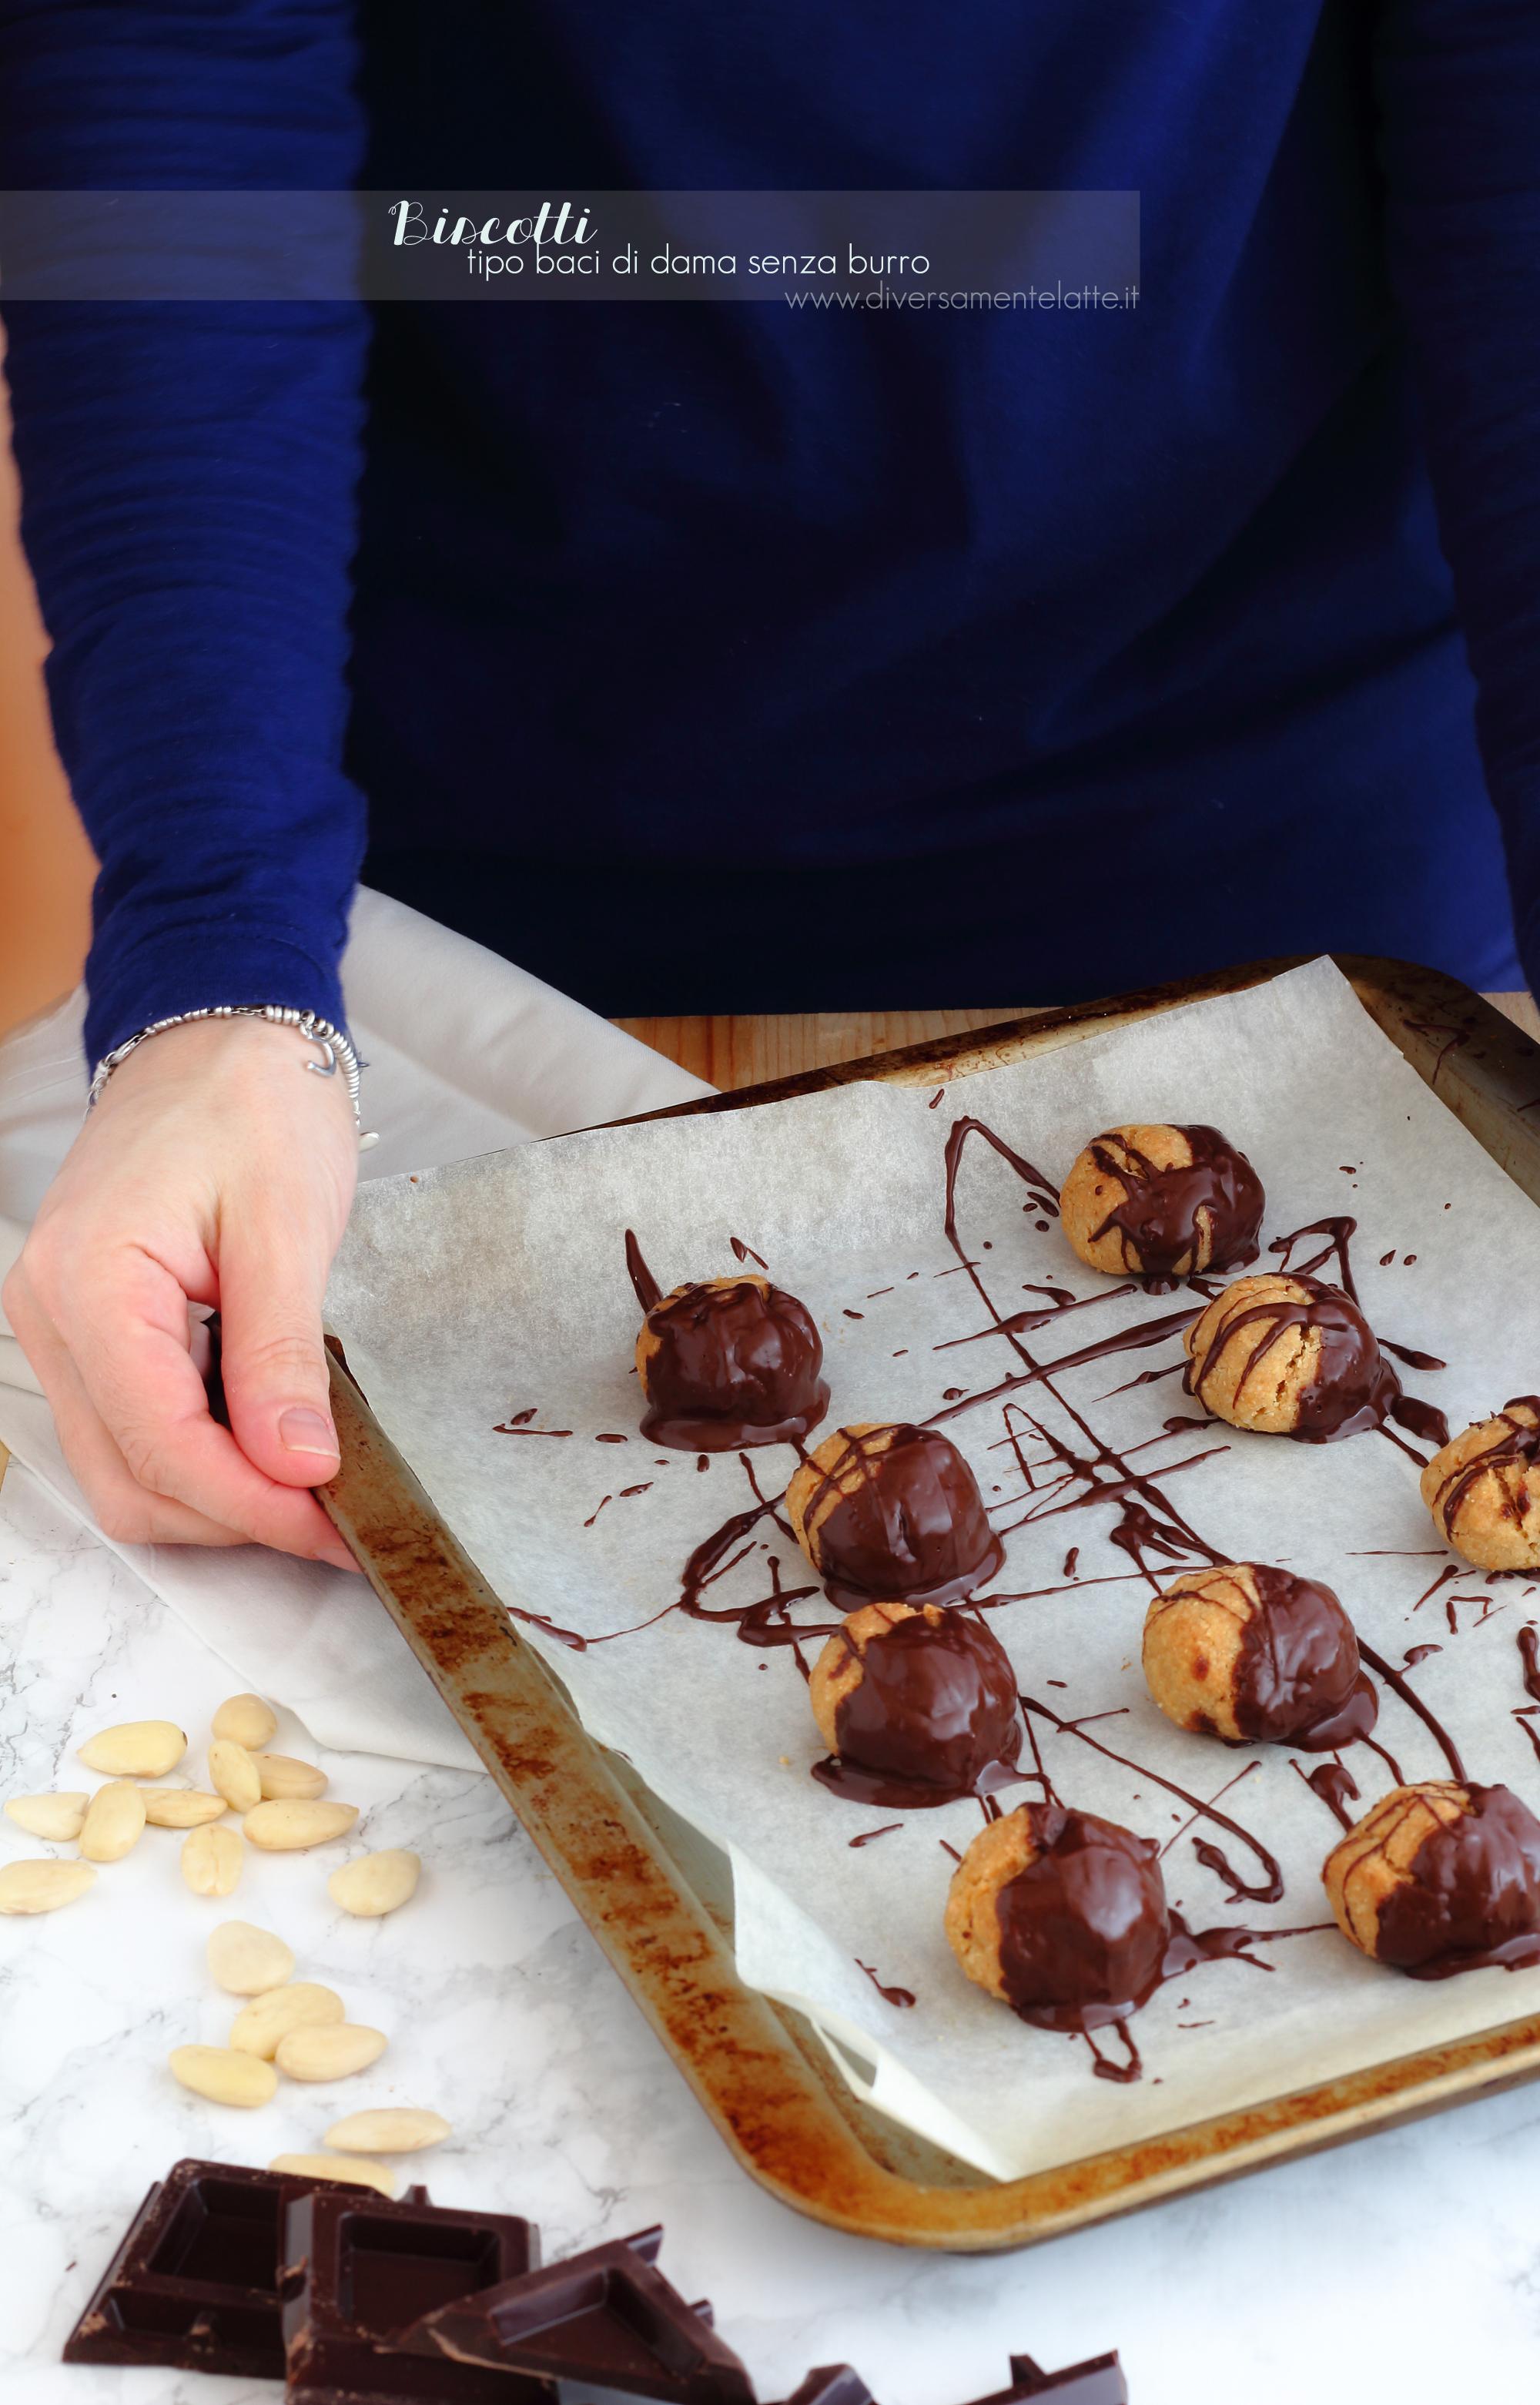 biscotti tipo baci di dama